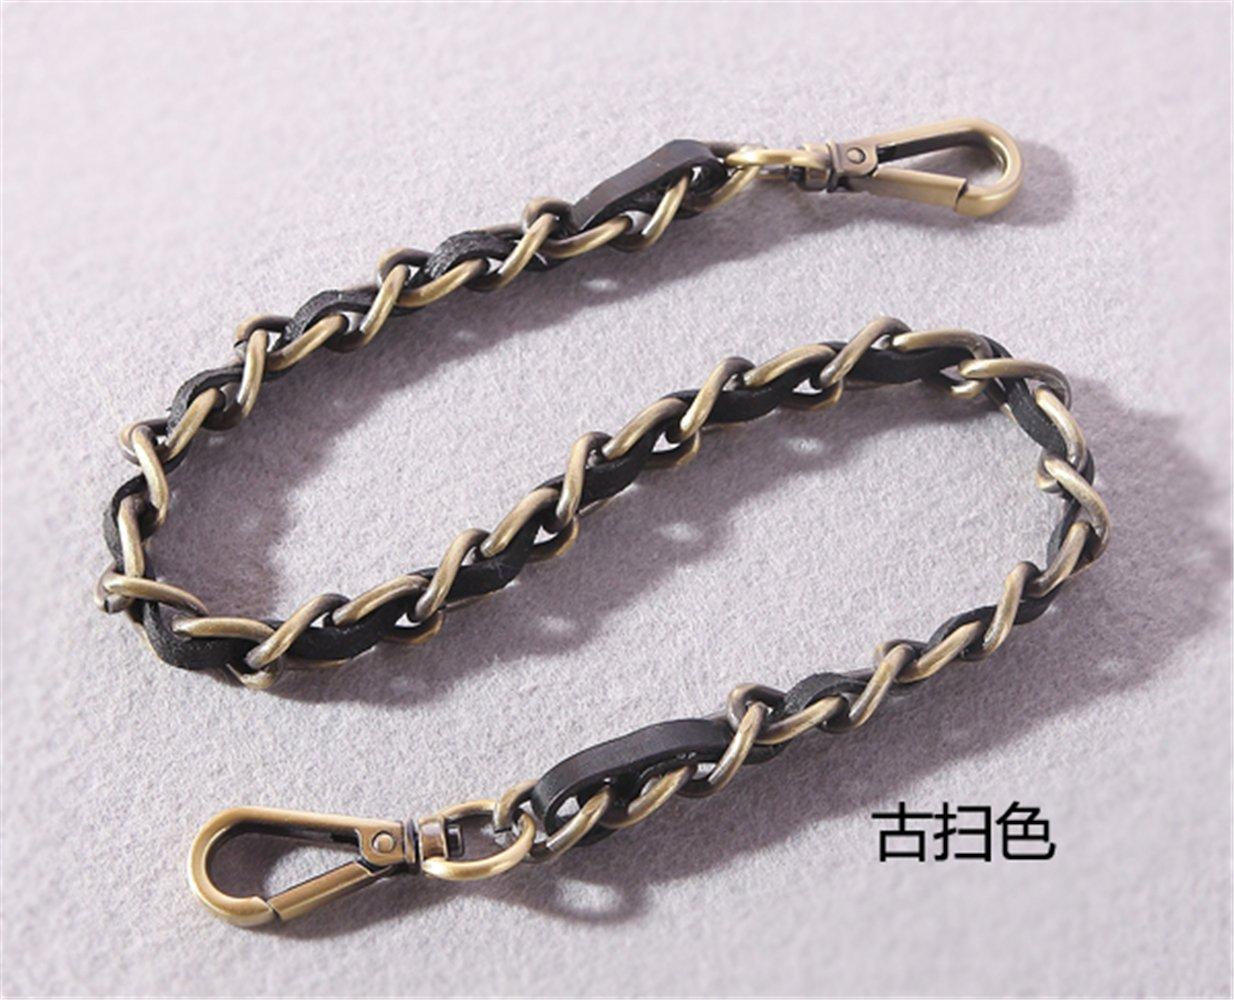 12mm Width PU Leather + Metal Chain For messenger bags Replacement Purse Strap / bag strap / handbag straps / shoulder strap DIY (Bronzed, 31 inch)